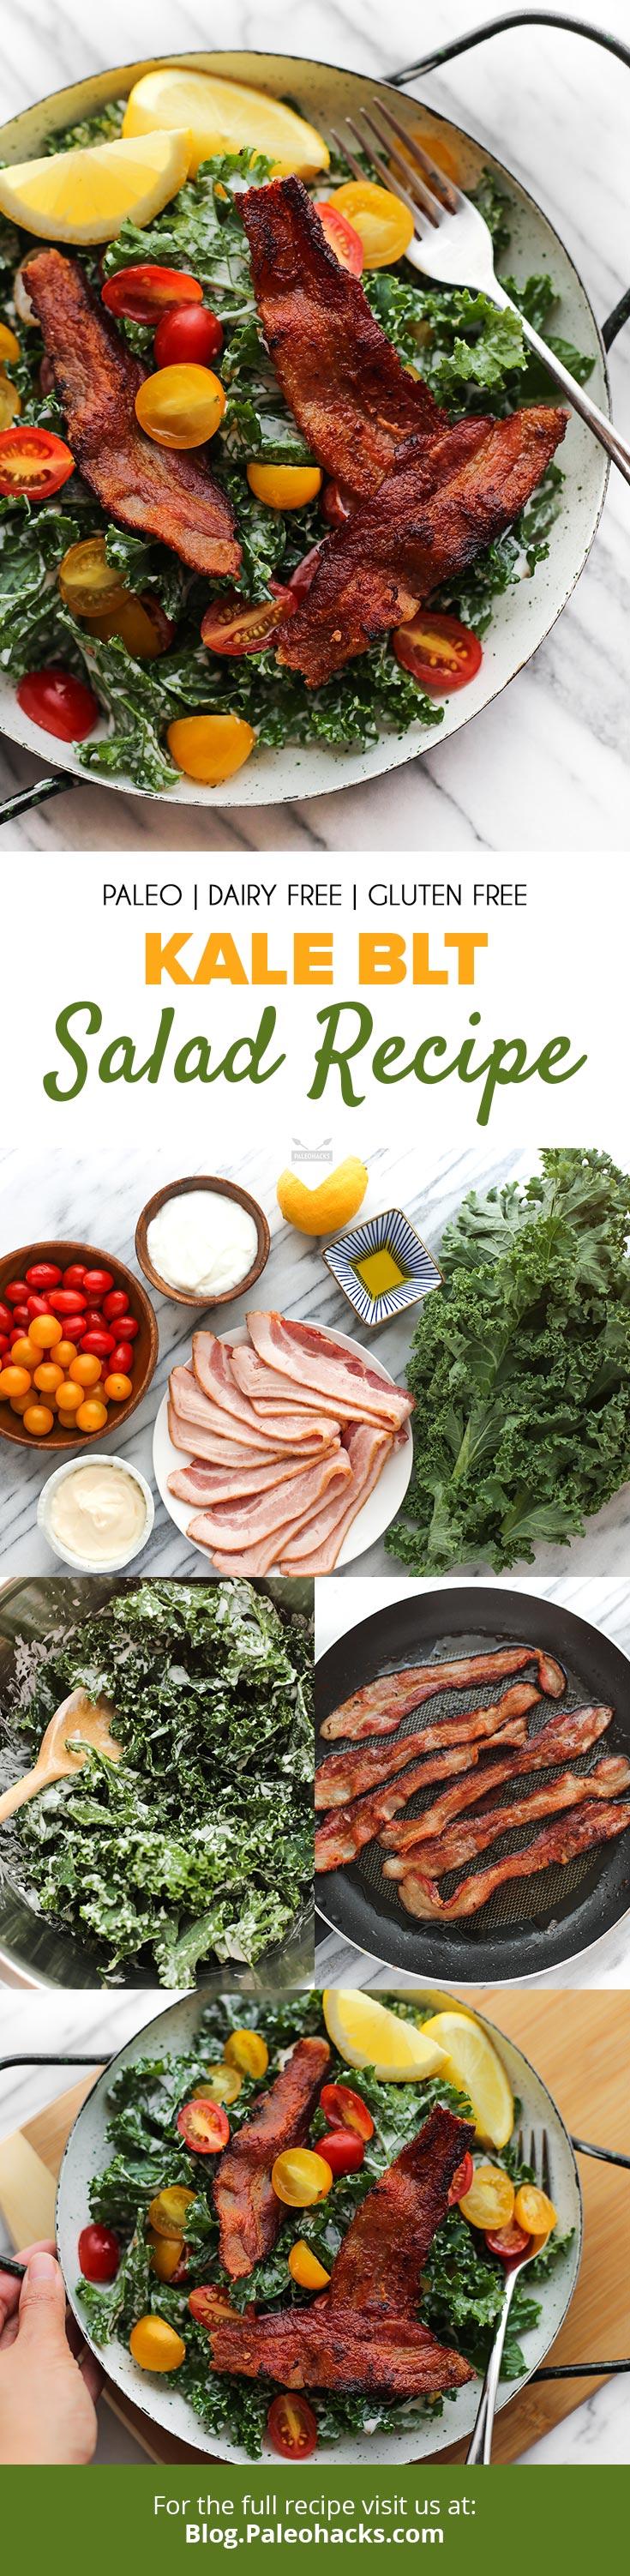 PIN-Kale-BLT-Salad-Recipe.jpg